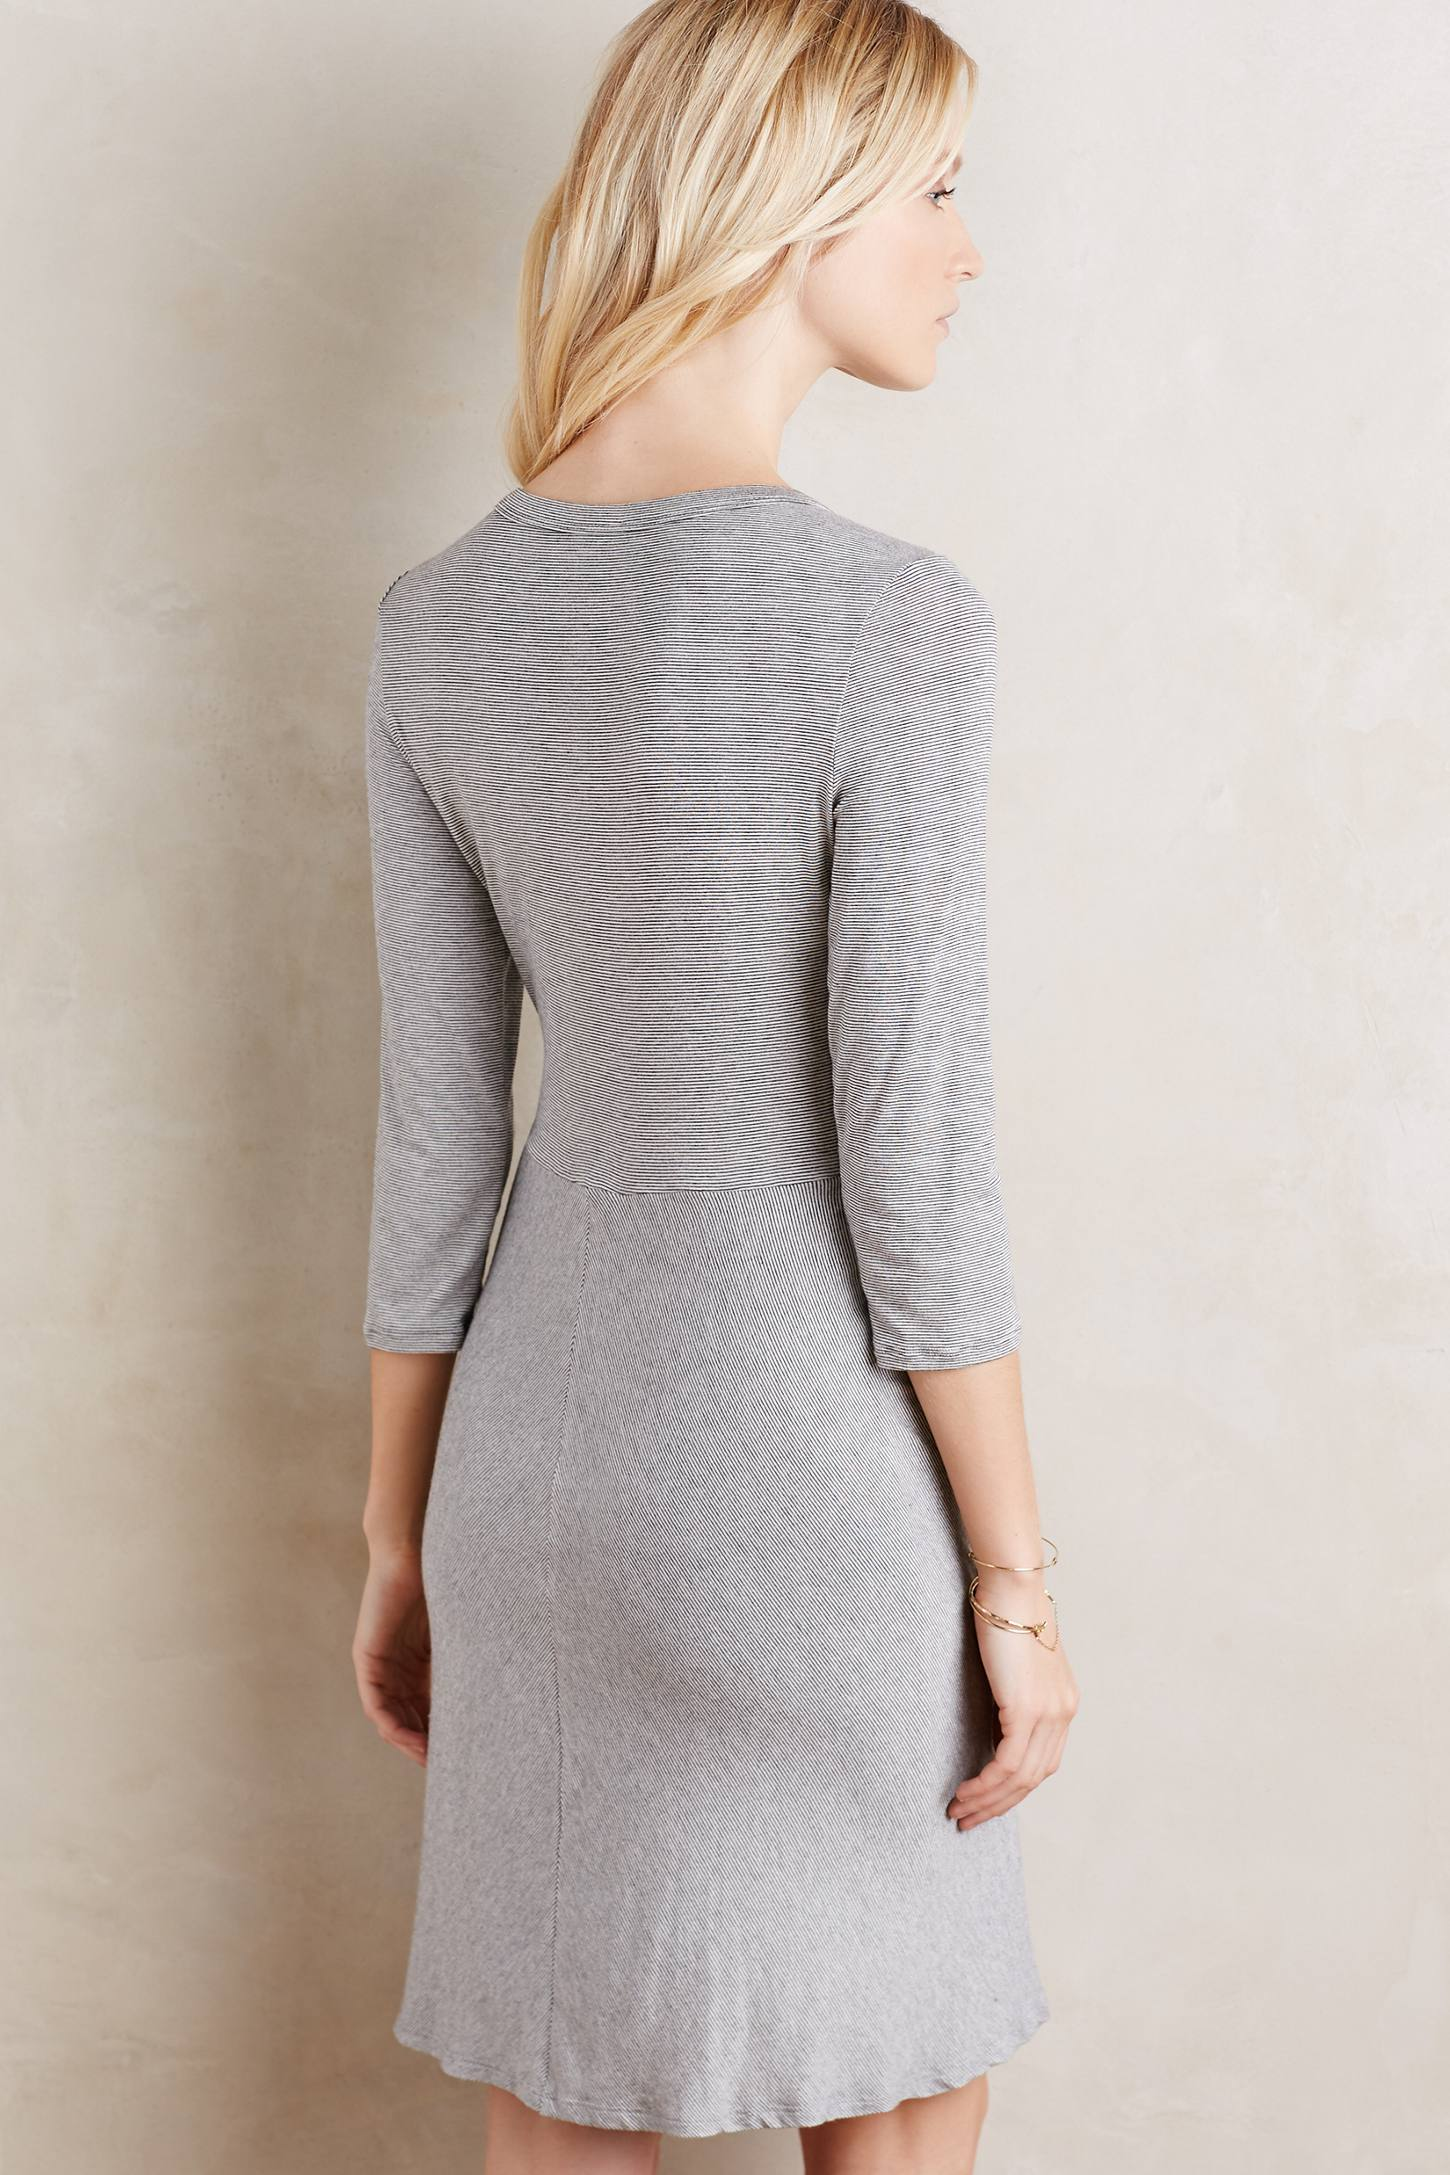 Knotted Knit Dress